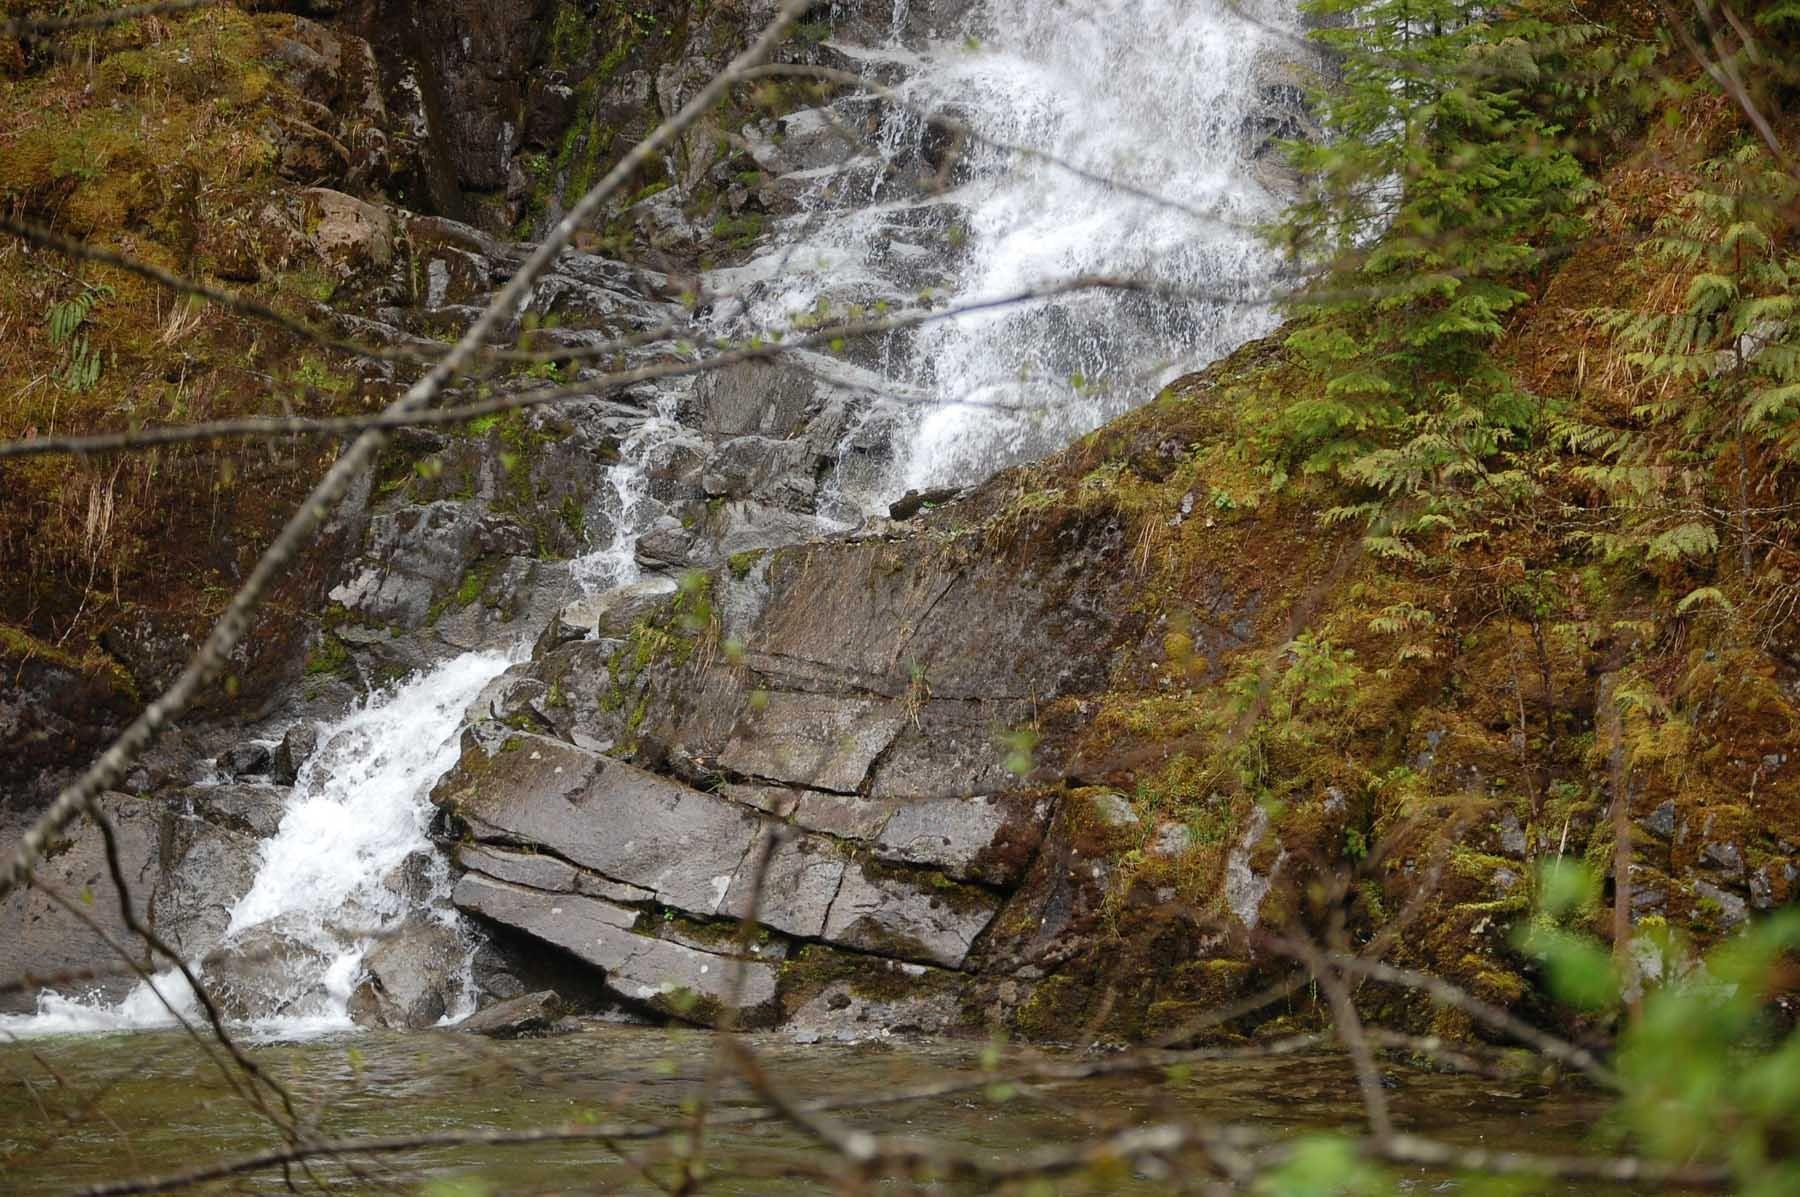 Up the Silver Skagit Road in Hope, BC. Photo by Darlene Butterfield Boucher. www.HopeBC.ca